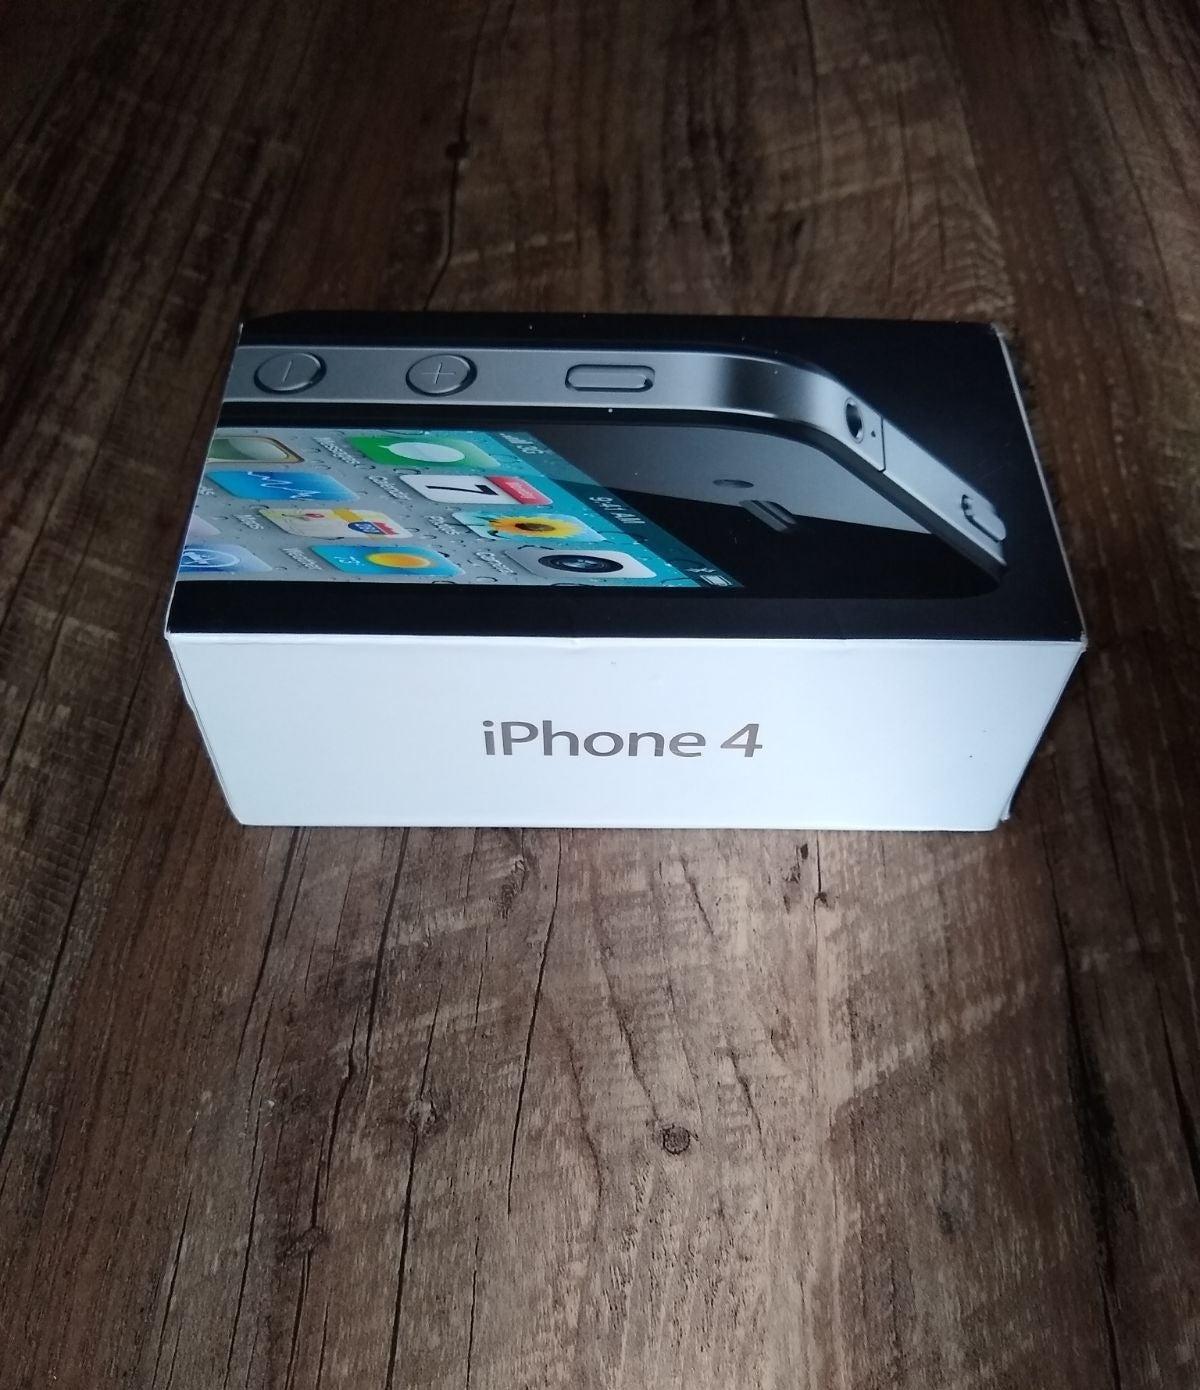 iPhone 4 Black 16 GB Box